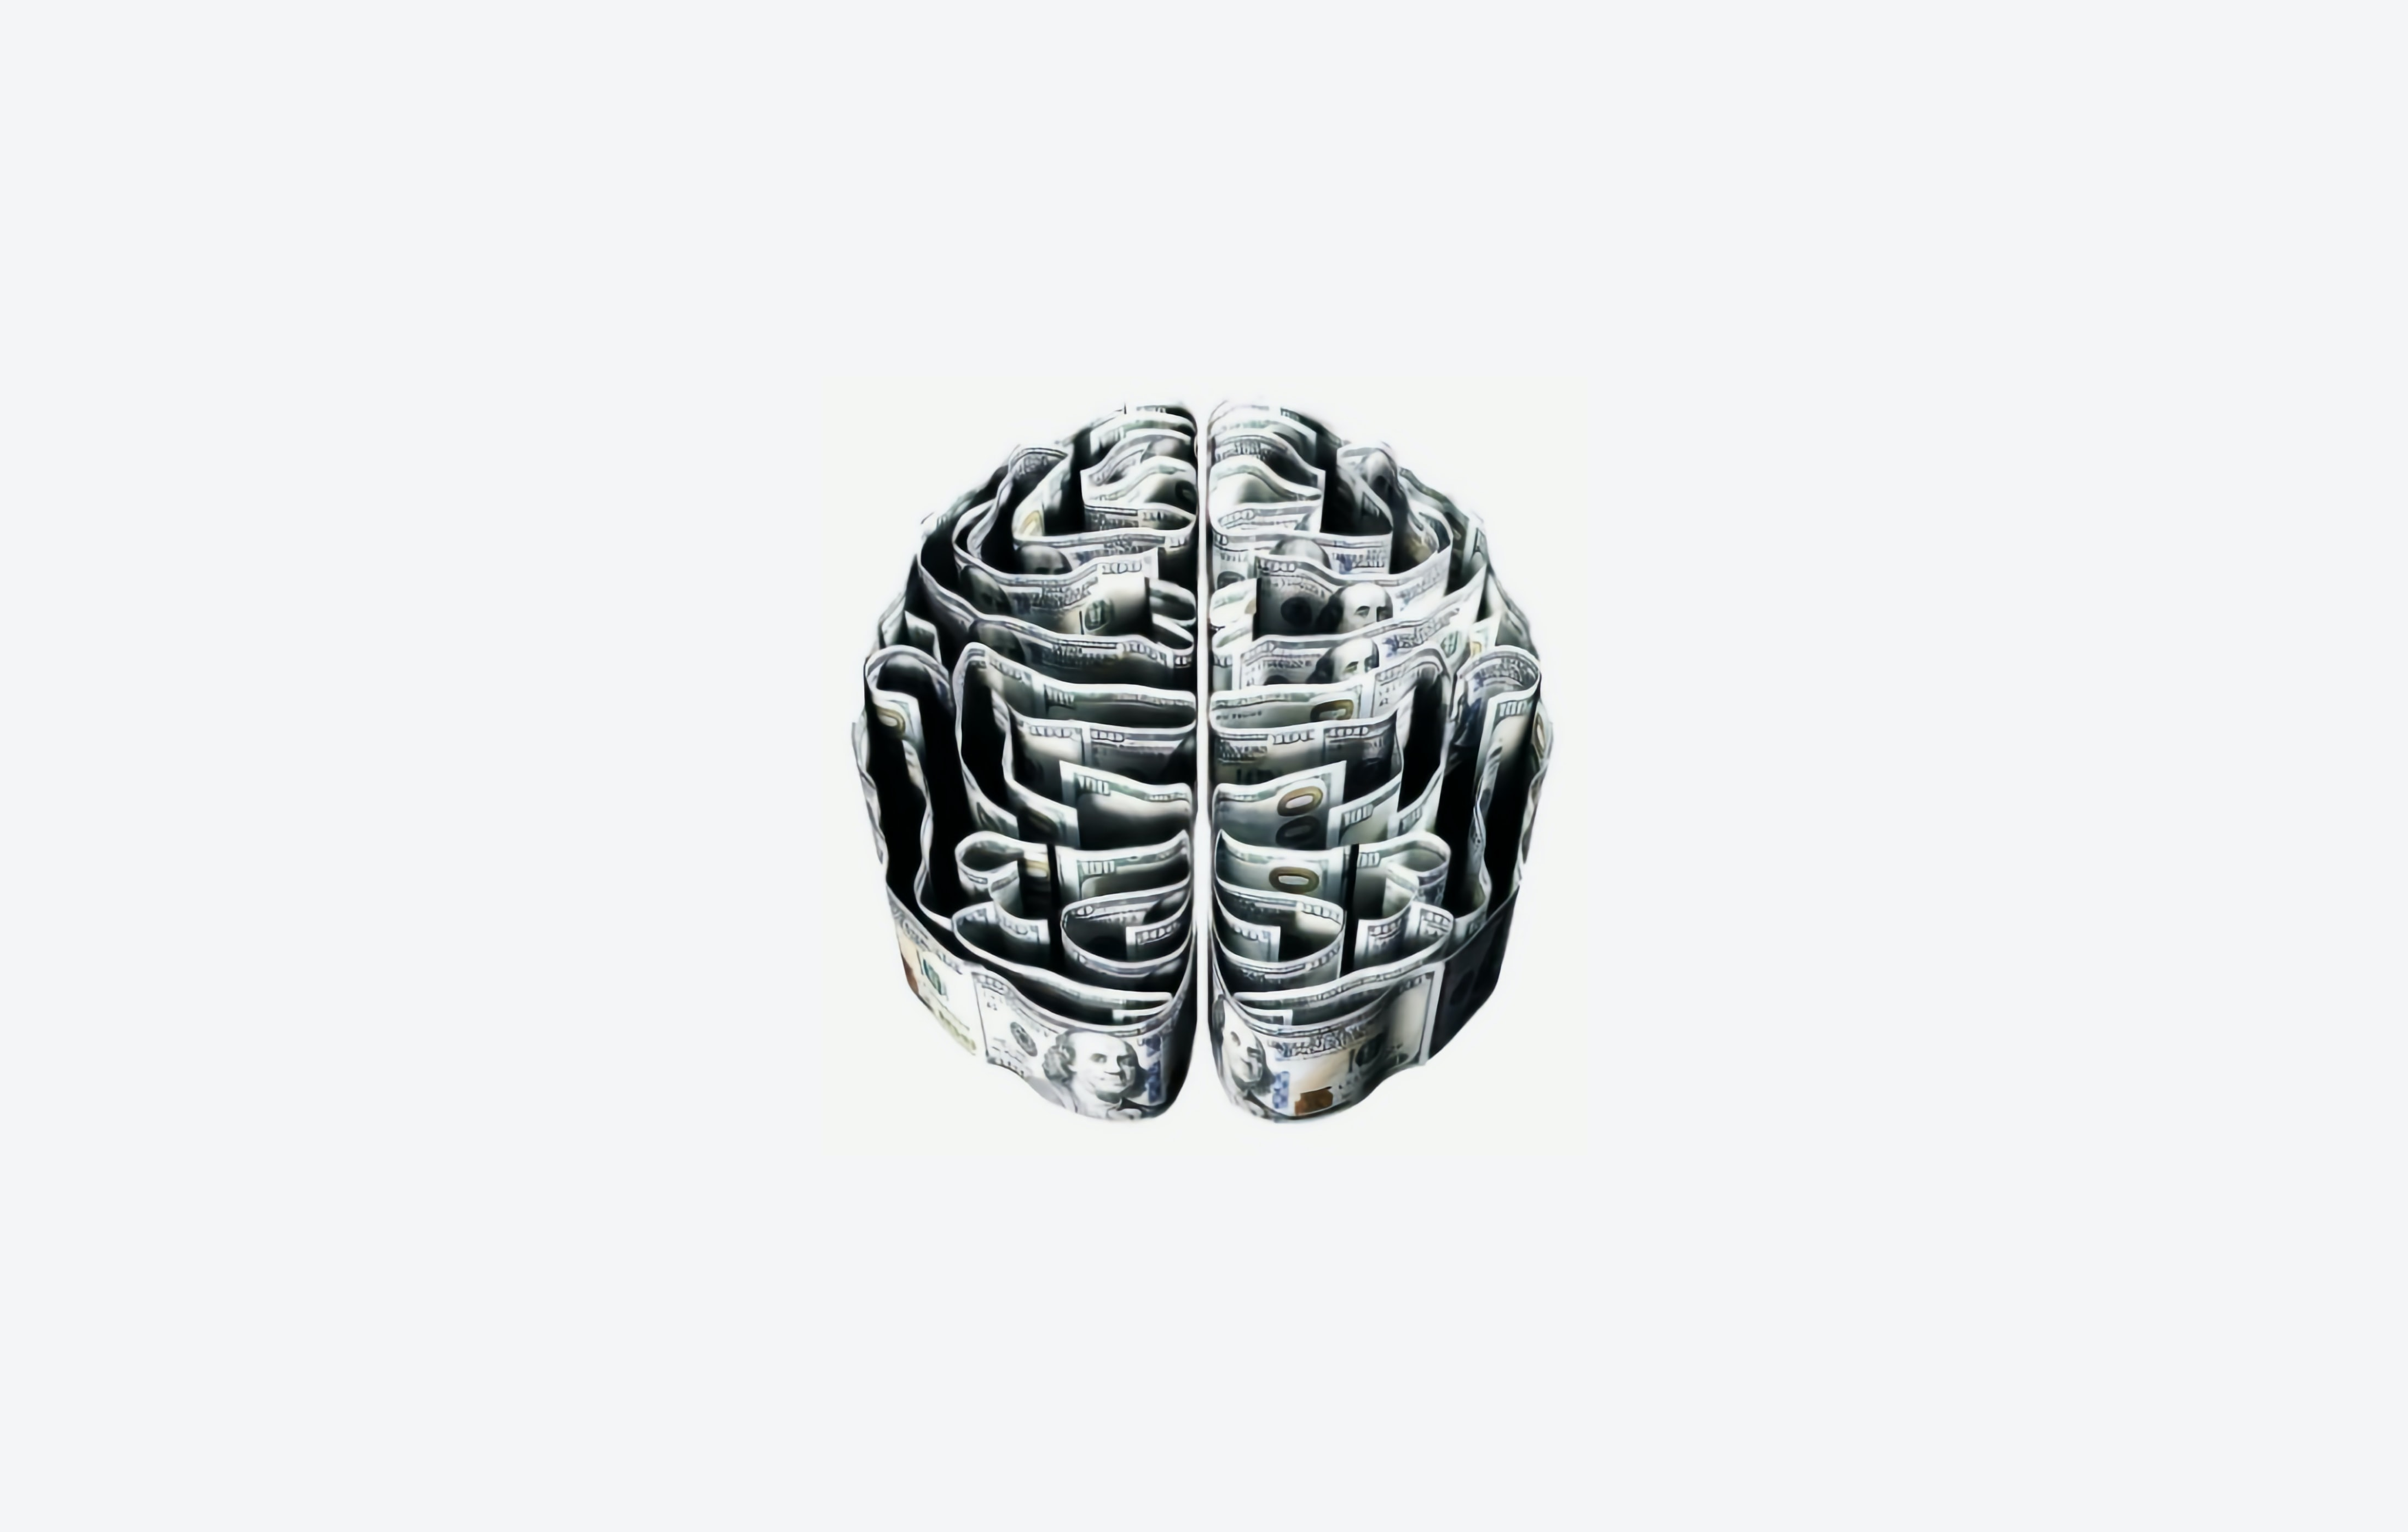 a brain composed of dollar bills; pre-employment assessment